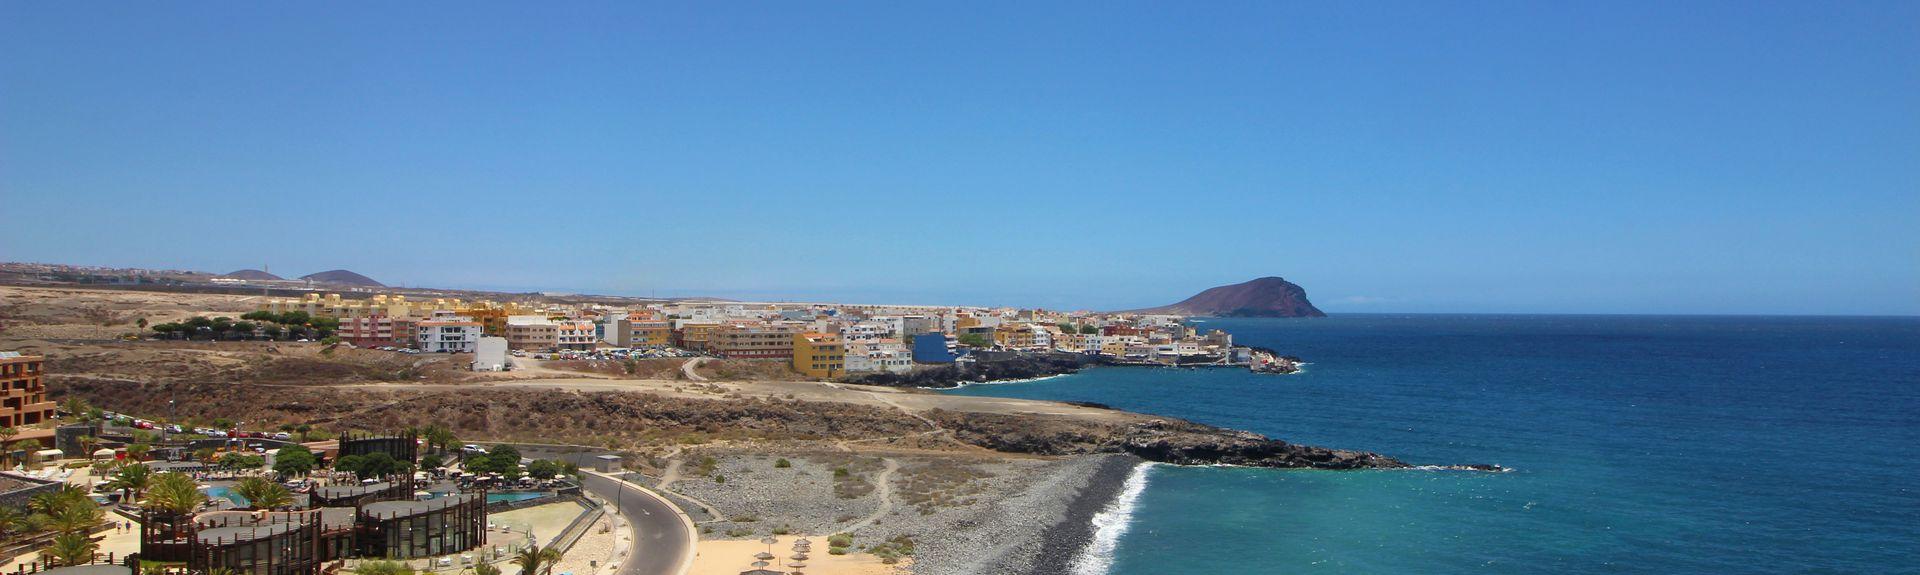 Arona, Canary Islands, Spain